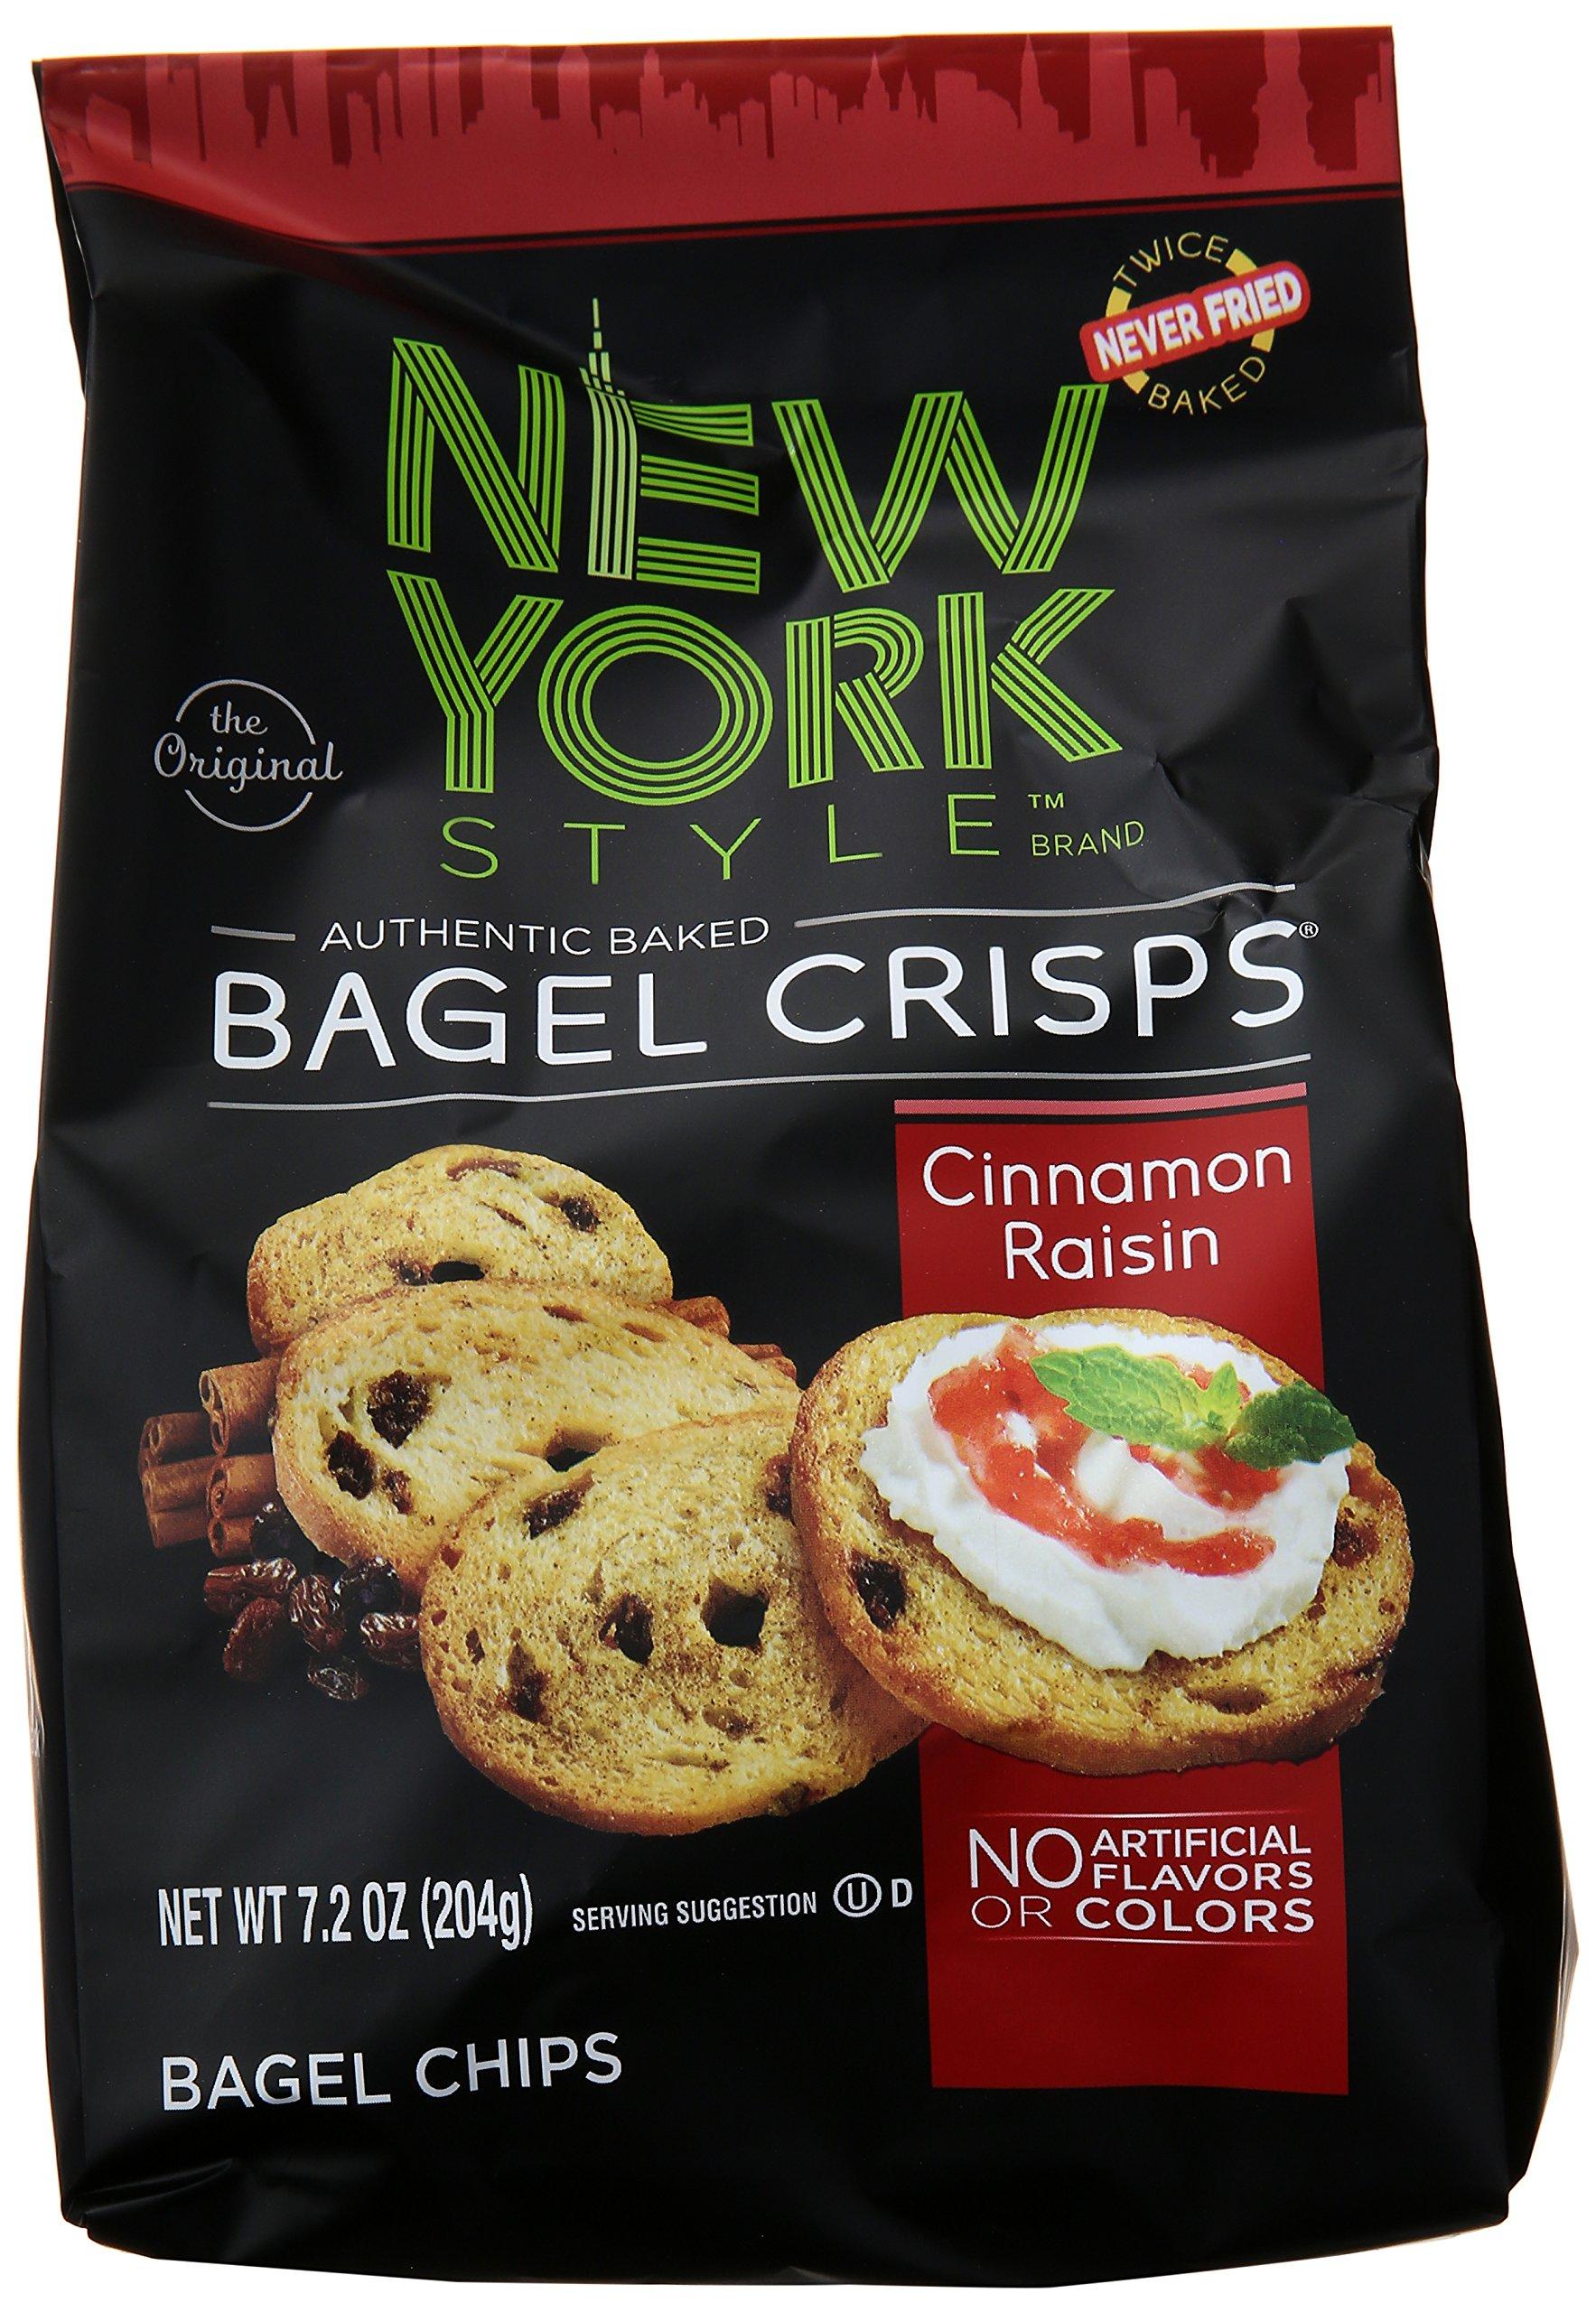 New York Style Bagel Crisps, Cinnamon Raisin, 7.2 Ounce by New York Style